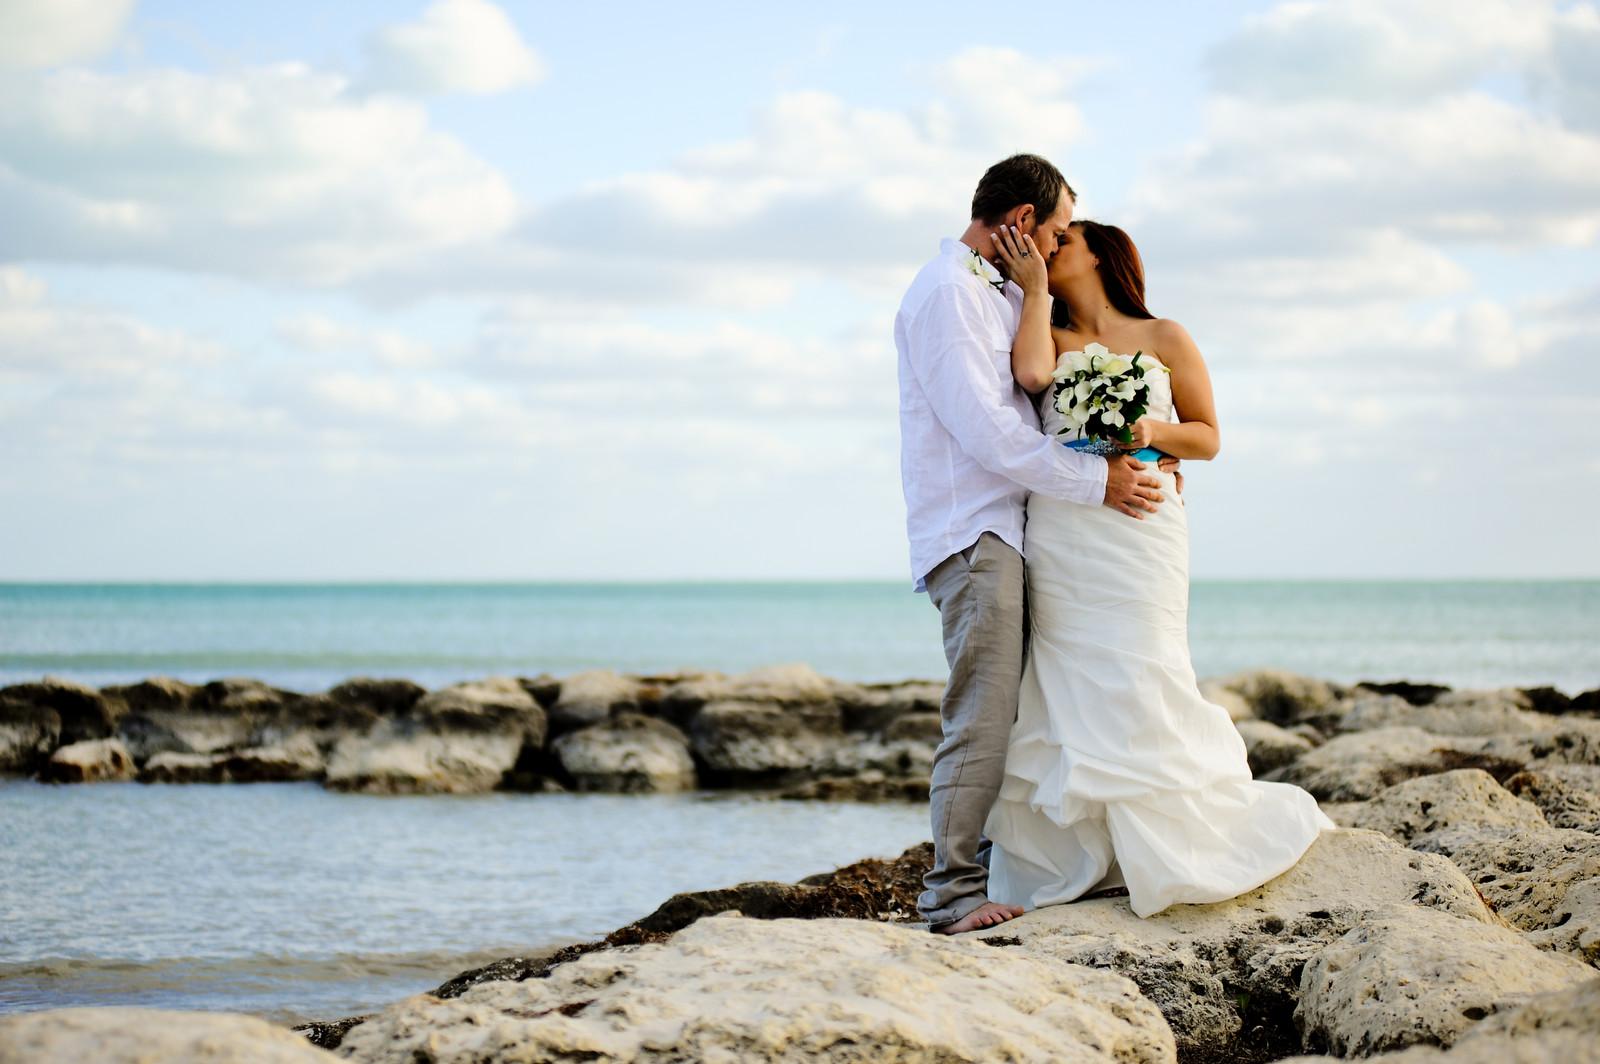 Smathers Beach Wedding Key West Jpg